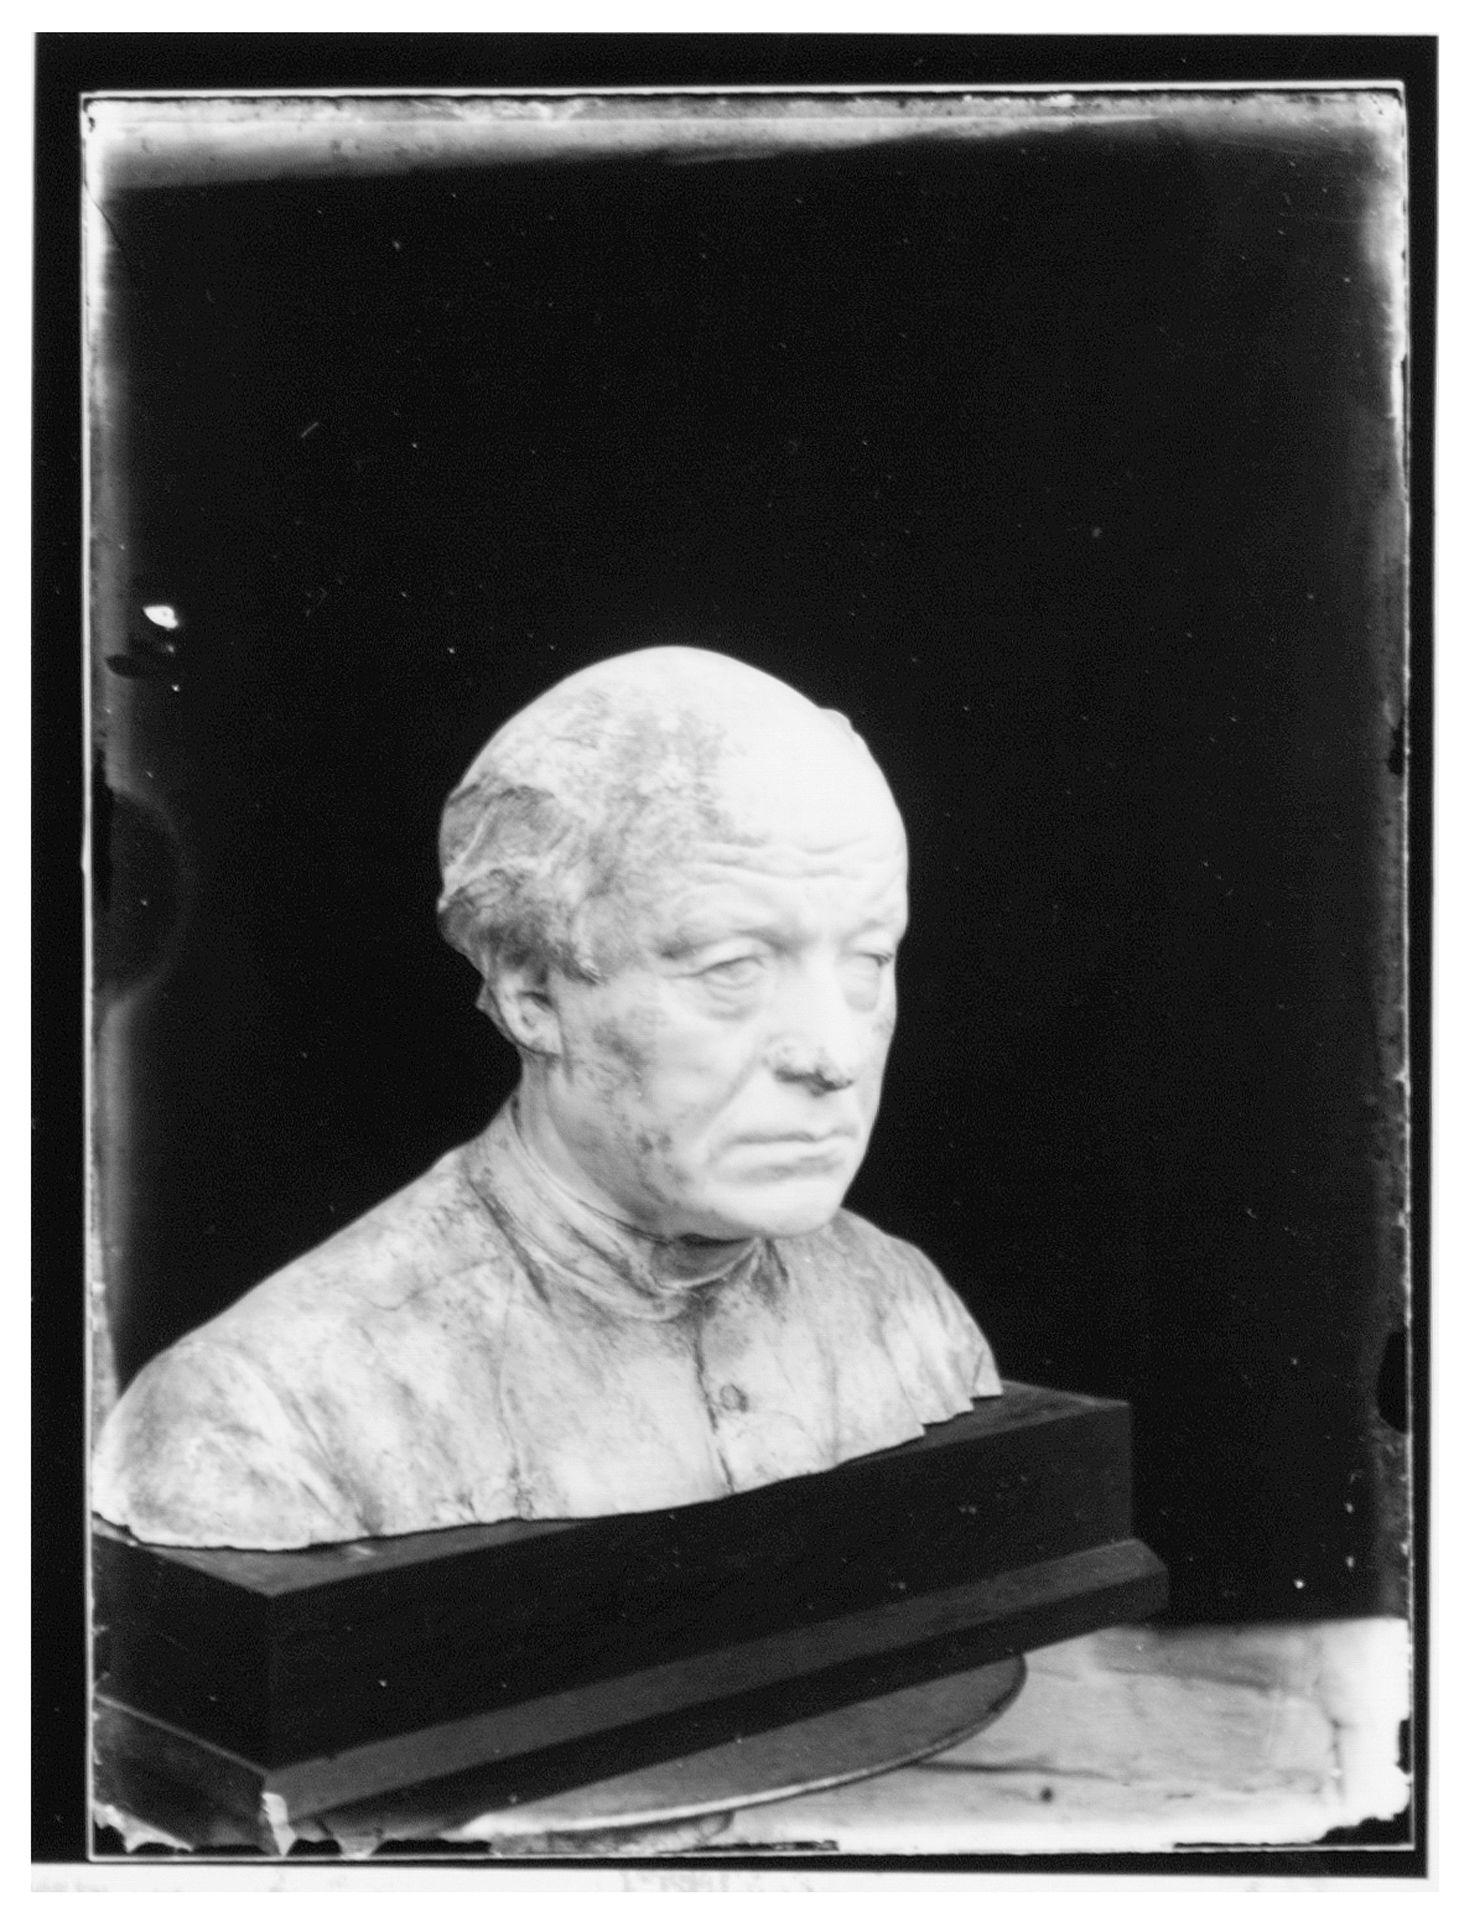 Westflandrica - buste van Guido Gezelle